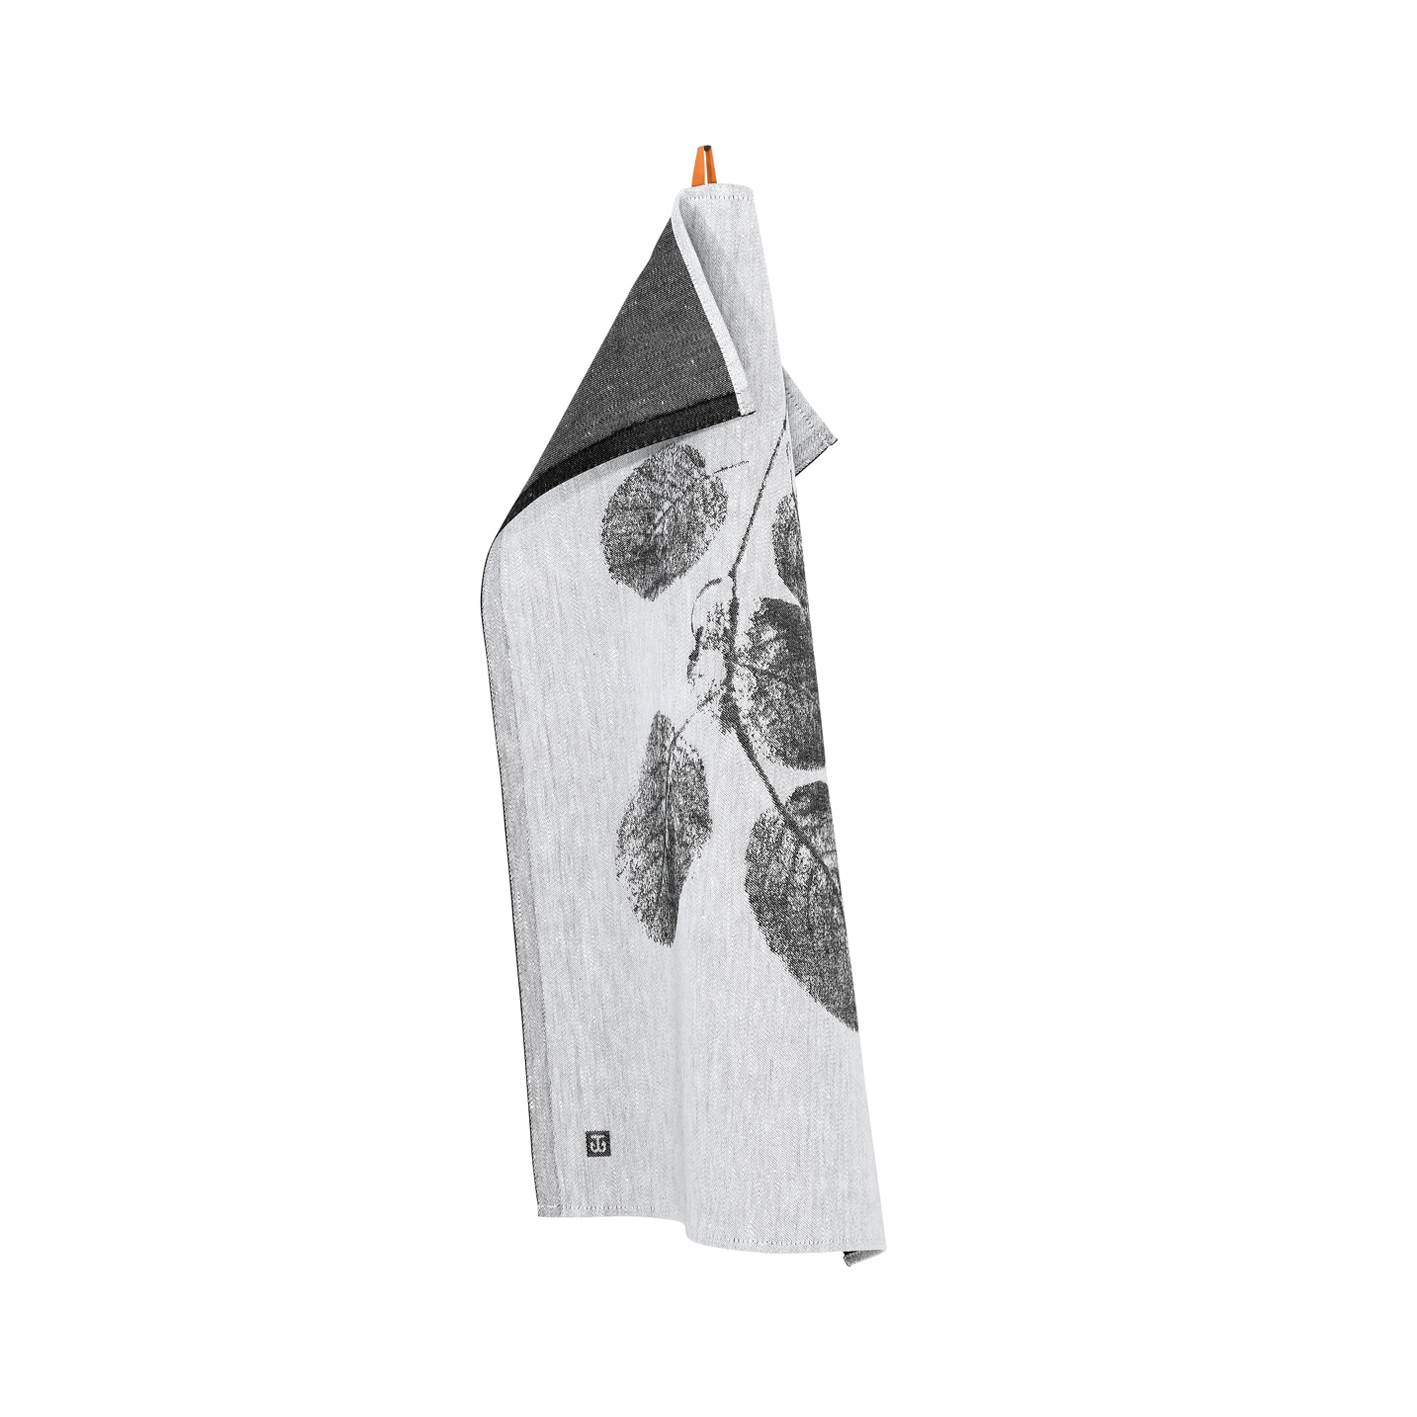 Goat willow tea towel